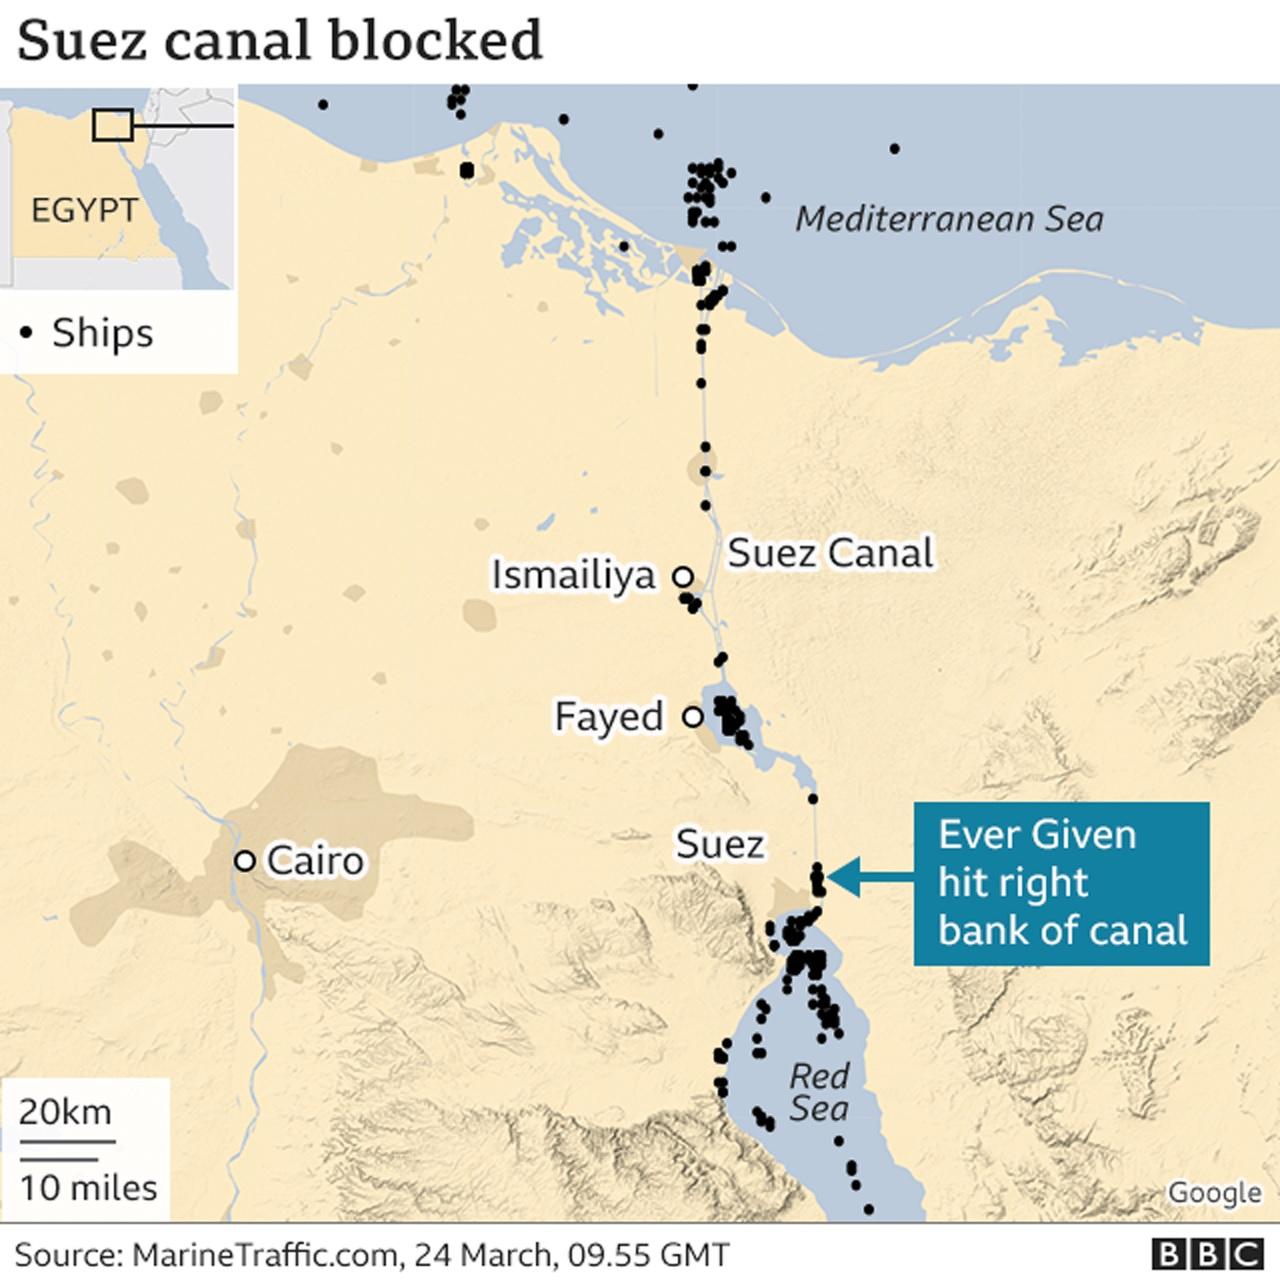 2.Suez Canal Blockage Explained